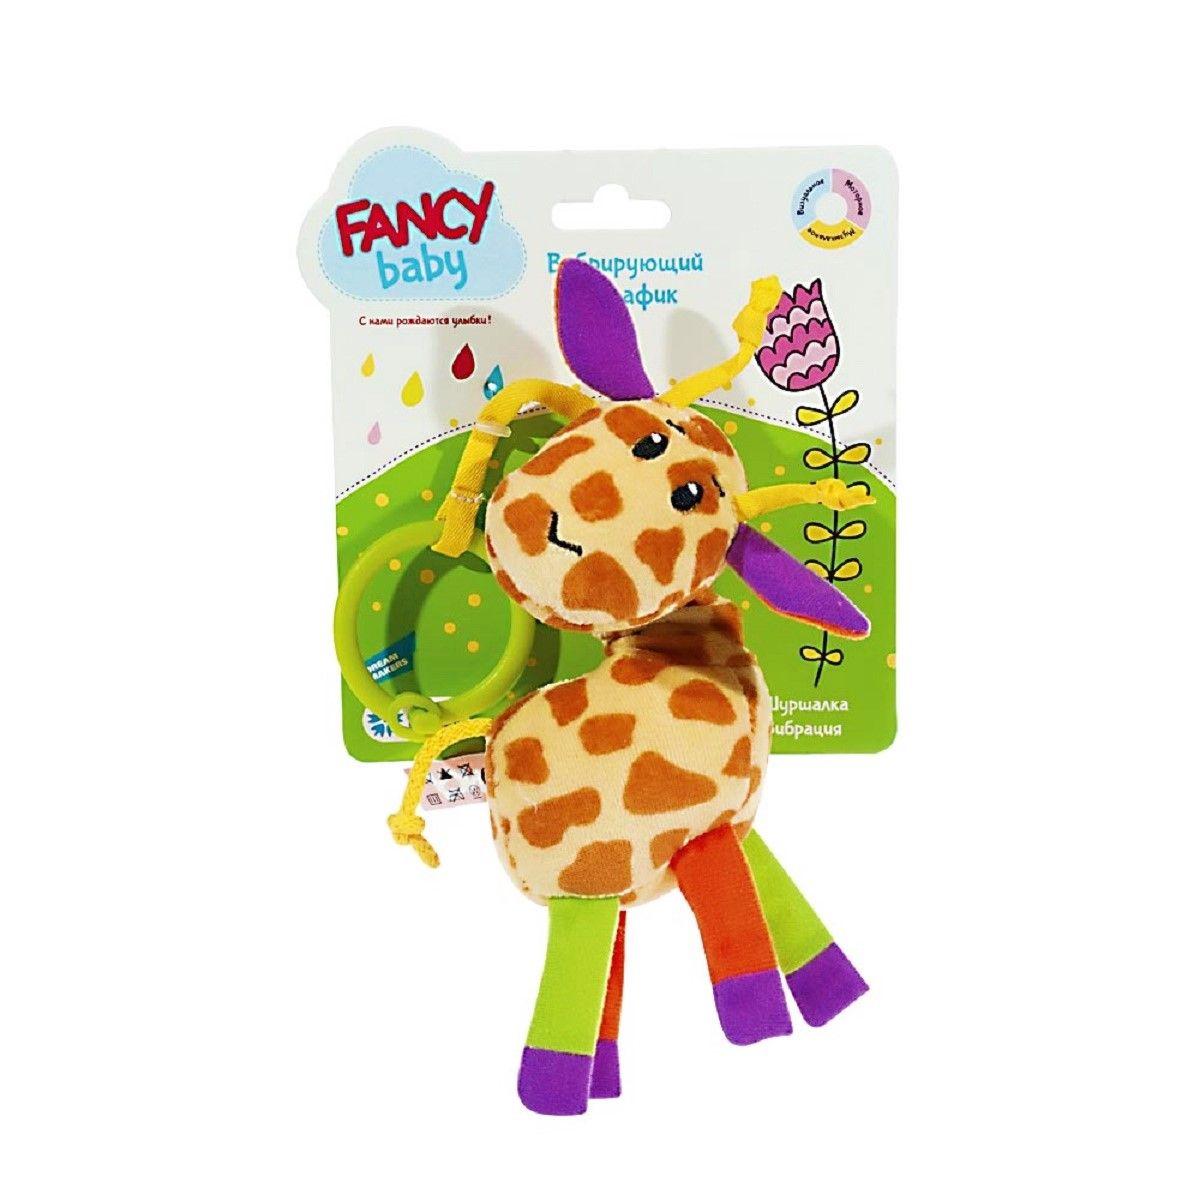 Fancy Развивающая игрушка Жирафик вибрирующая, Dream Makers